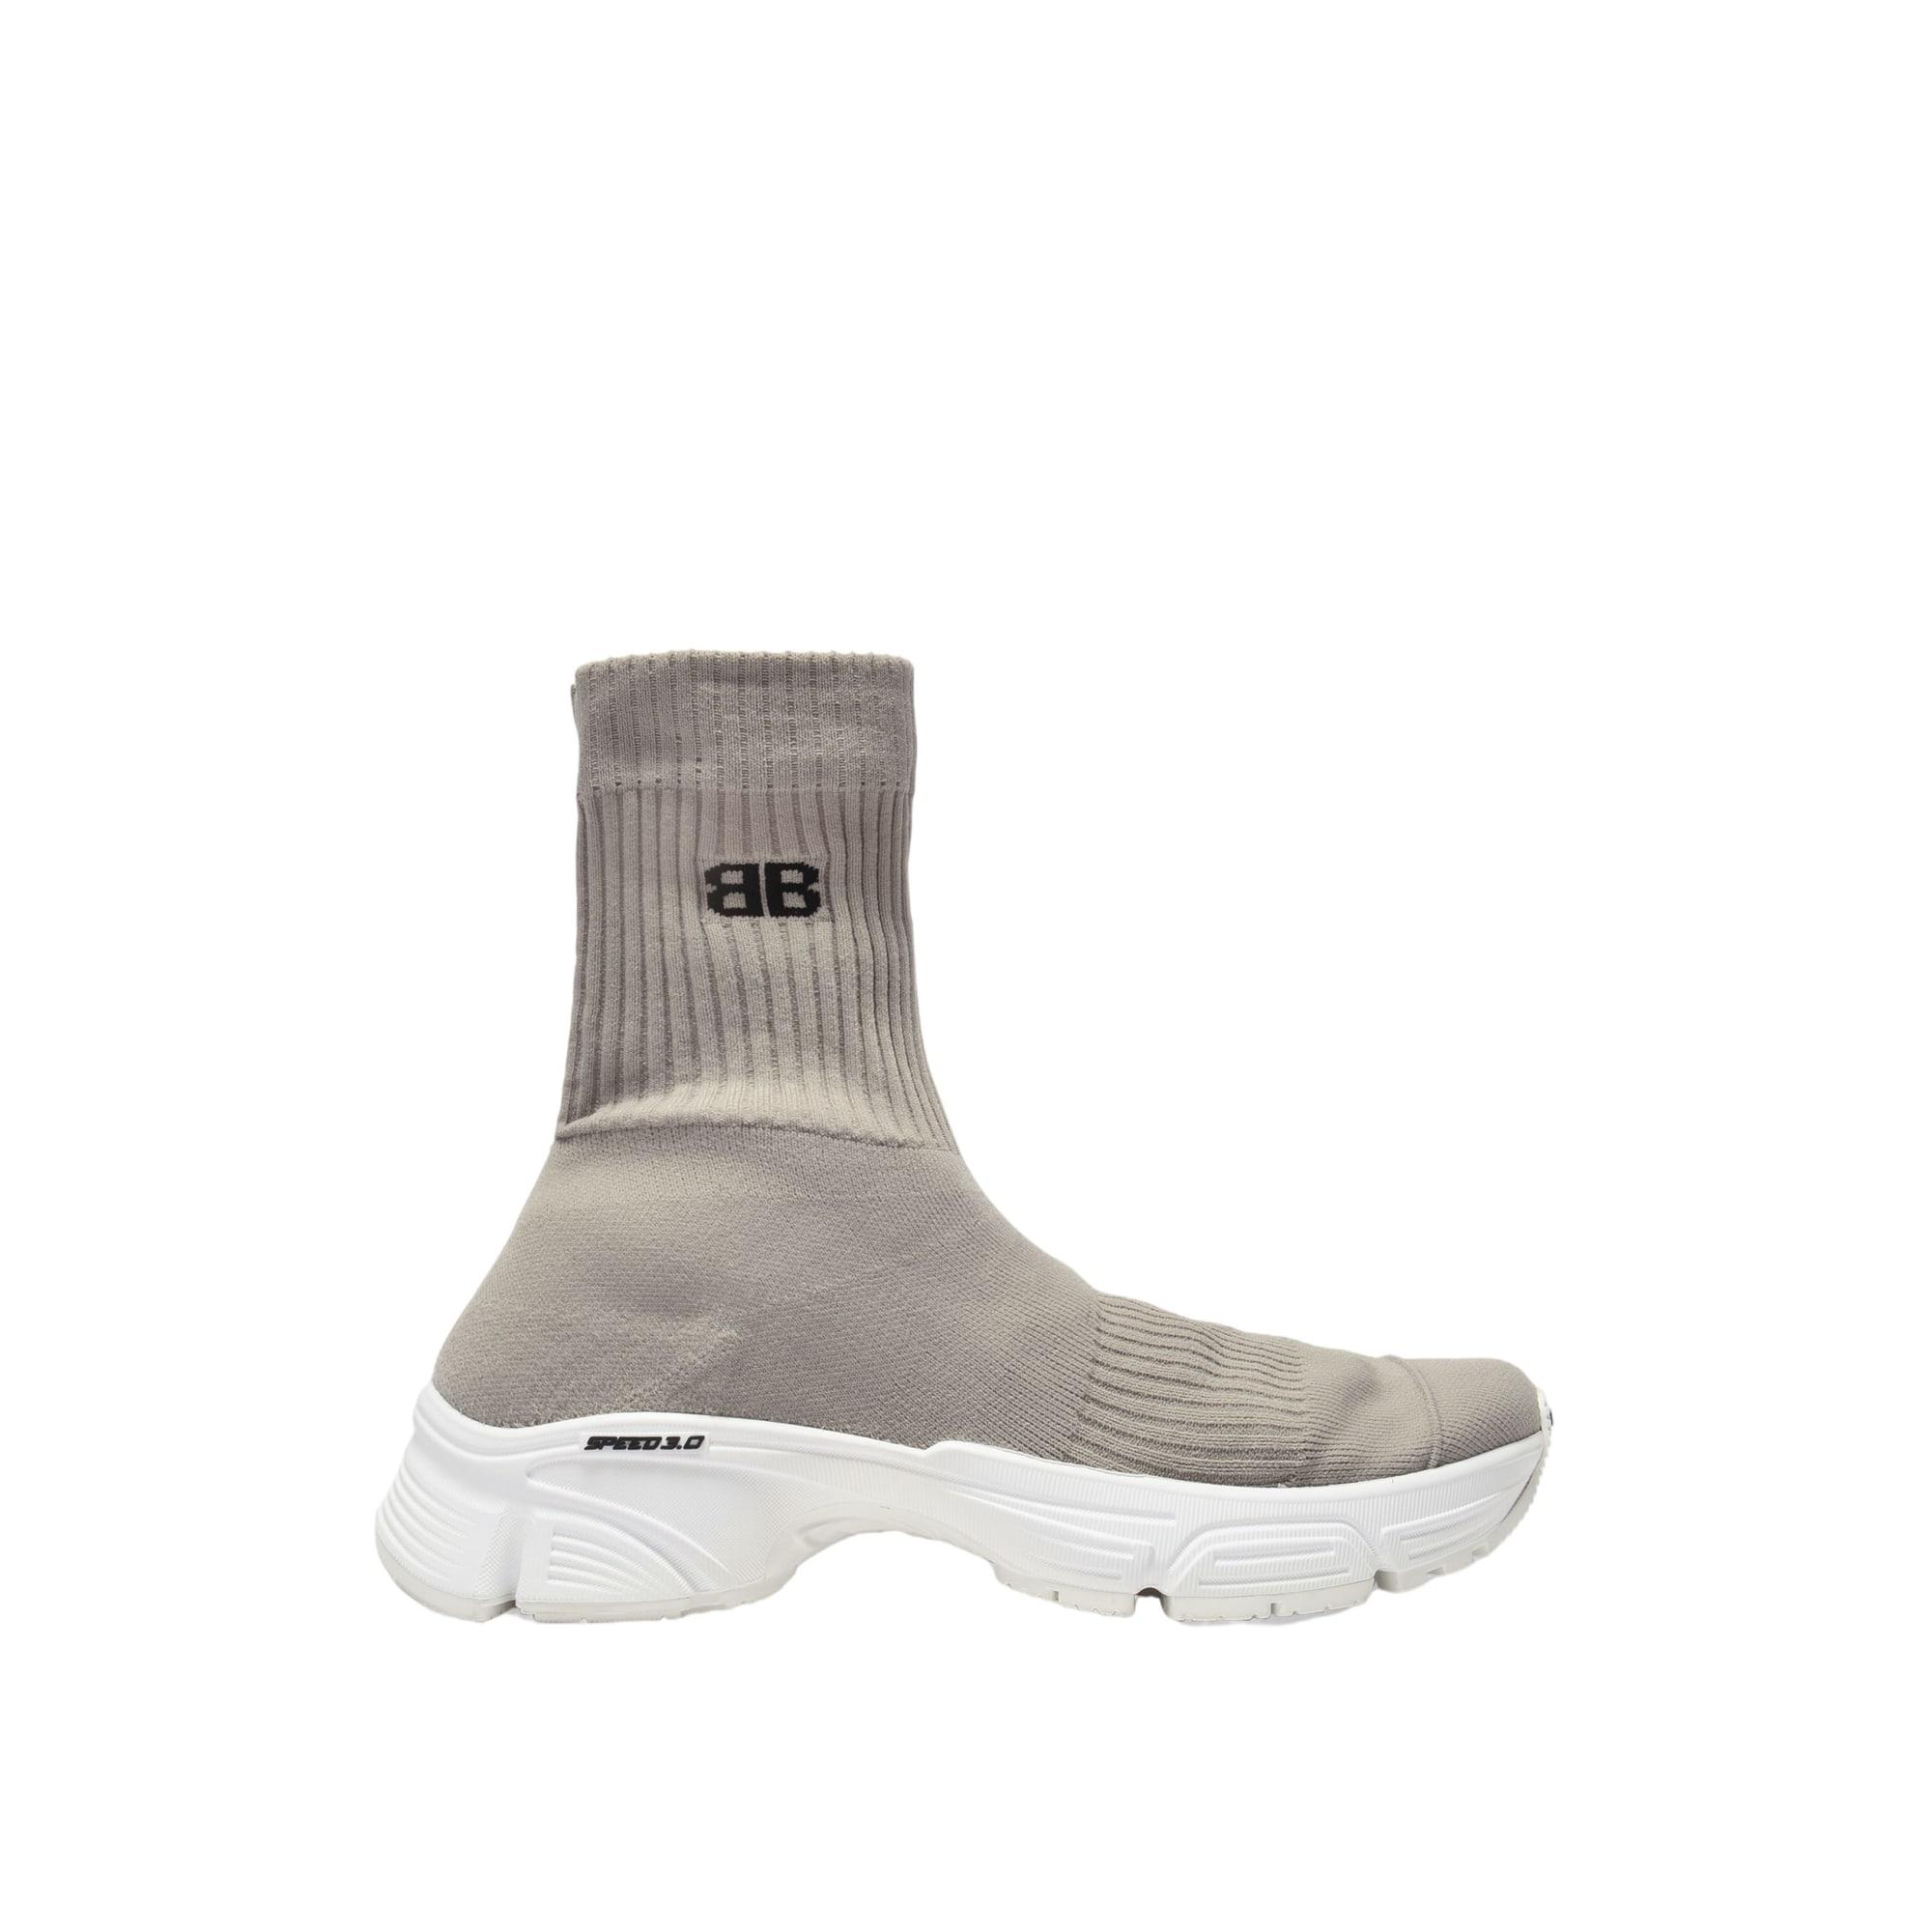 Sports Sneakers BALENCIAGA Gray, charcoal